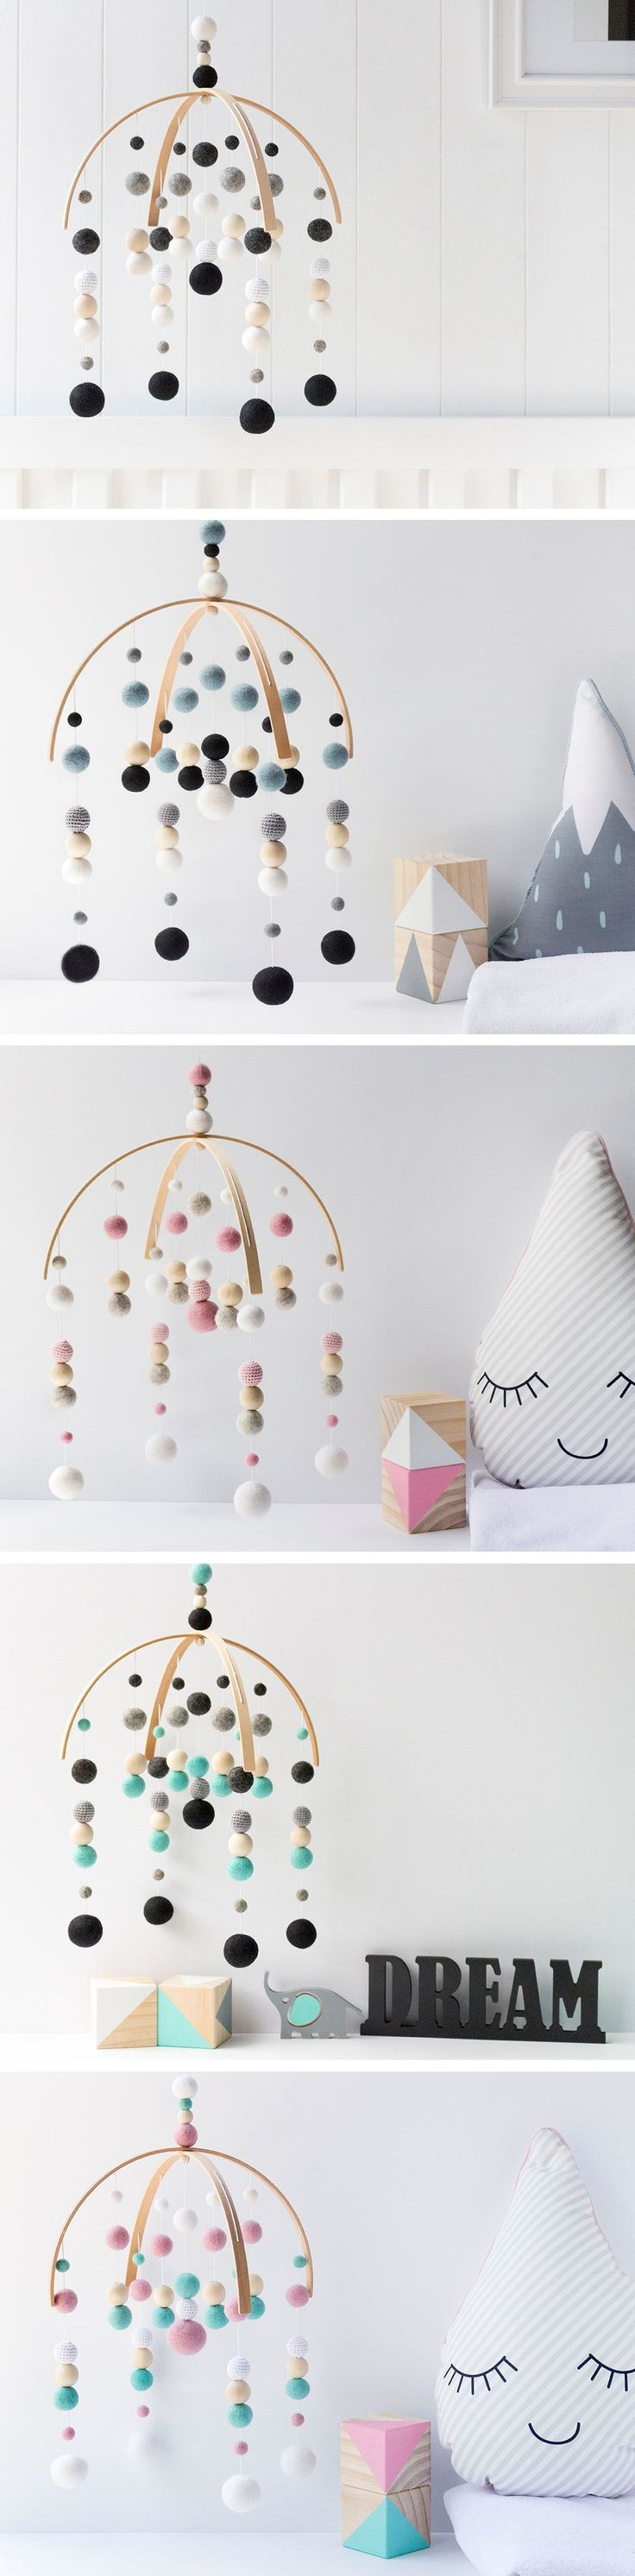 decoration creche bebe amazing transformer affaires bb with decoration creche bebe with. Black Bedroom Furniture Sets. Home Design Ideas